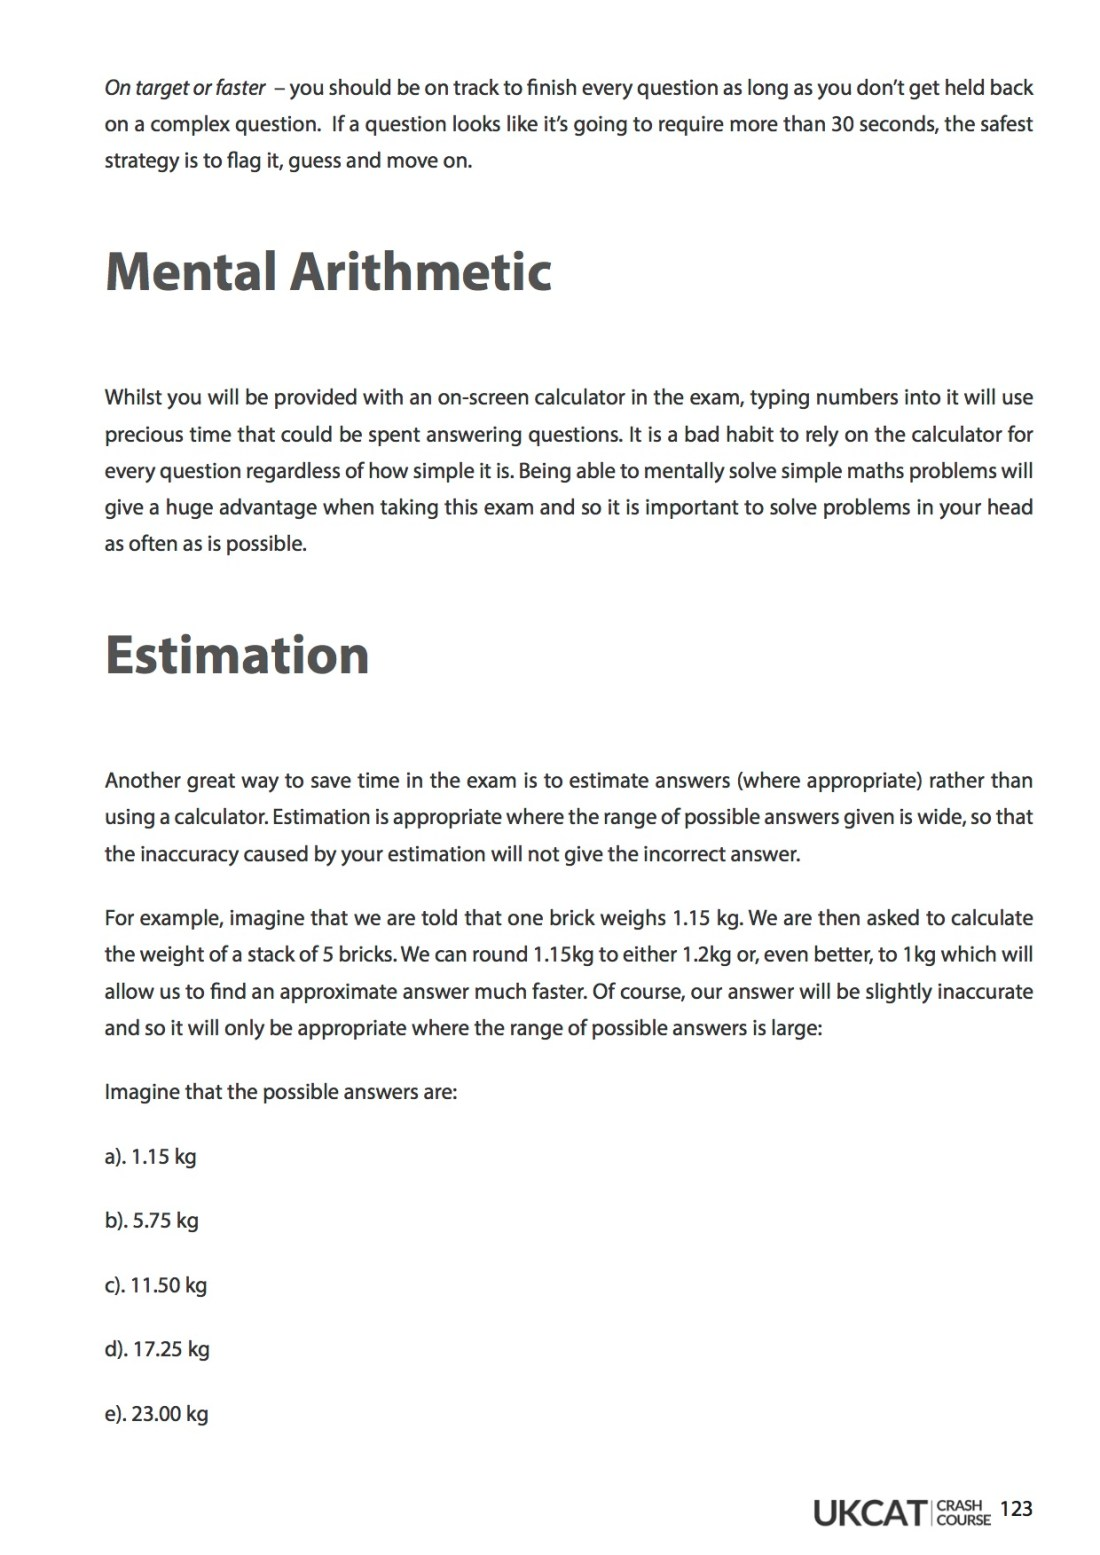 6med UCAT Crash Course Workbook - Quantitative Reasoning